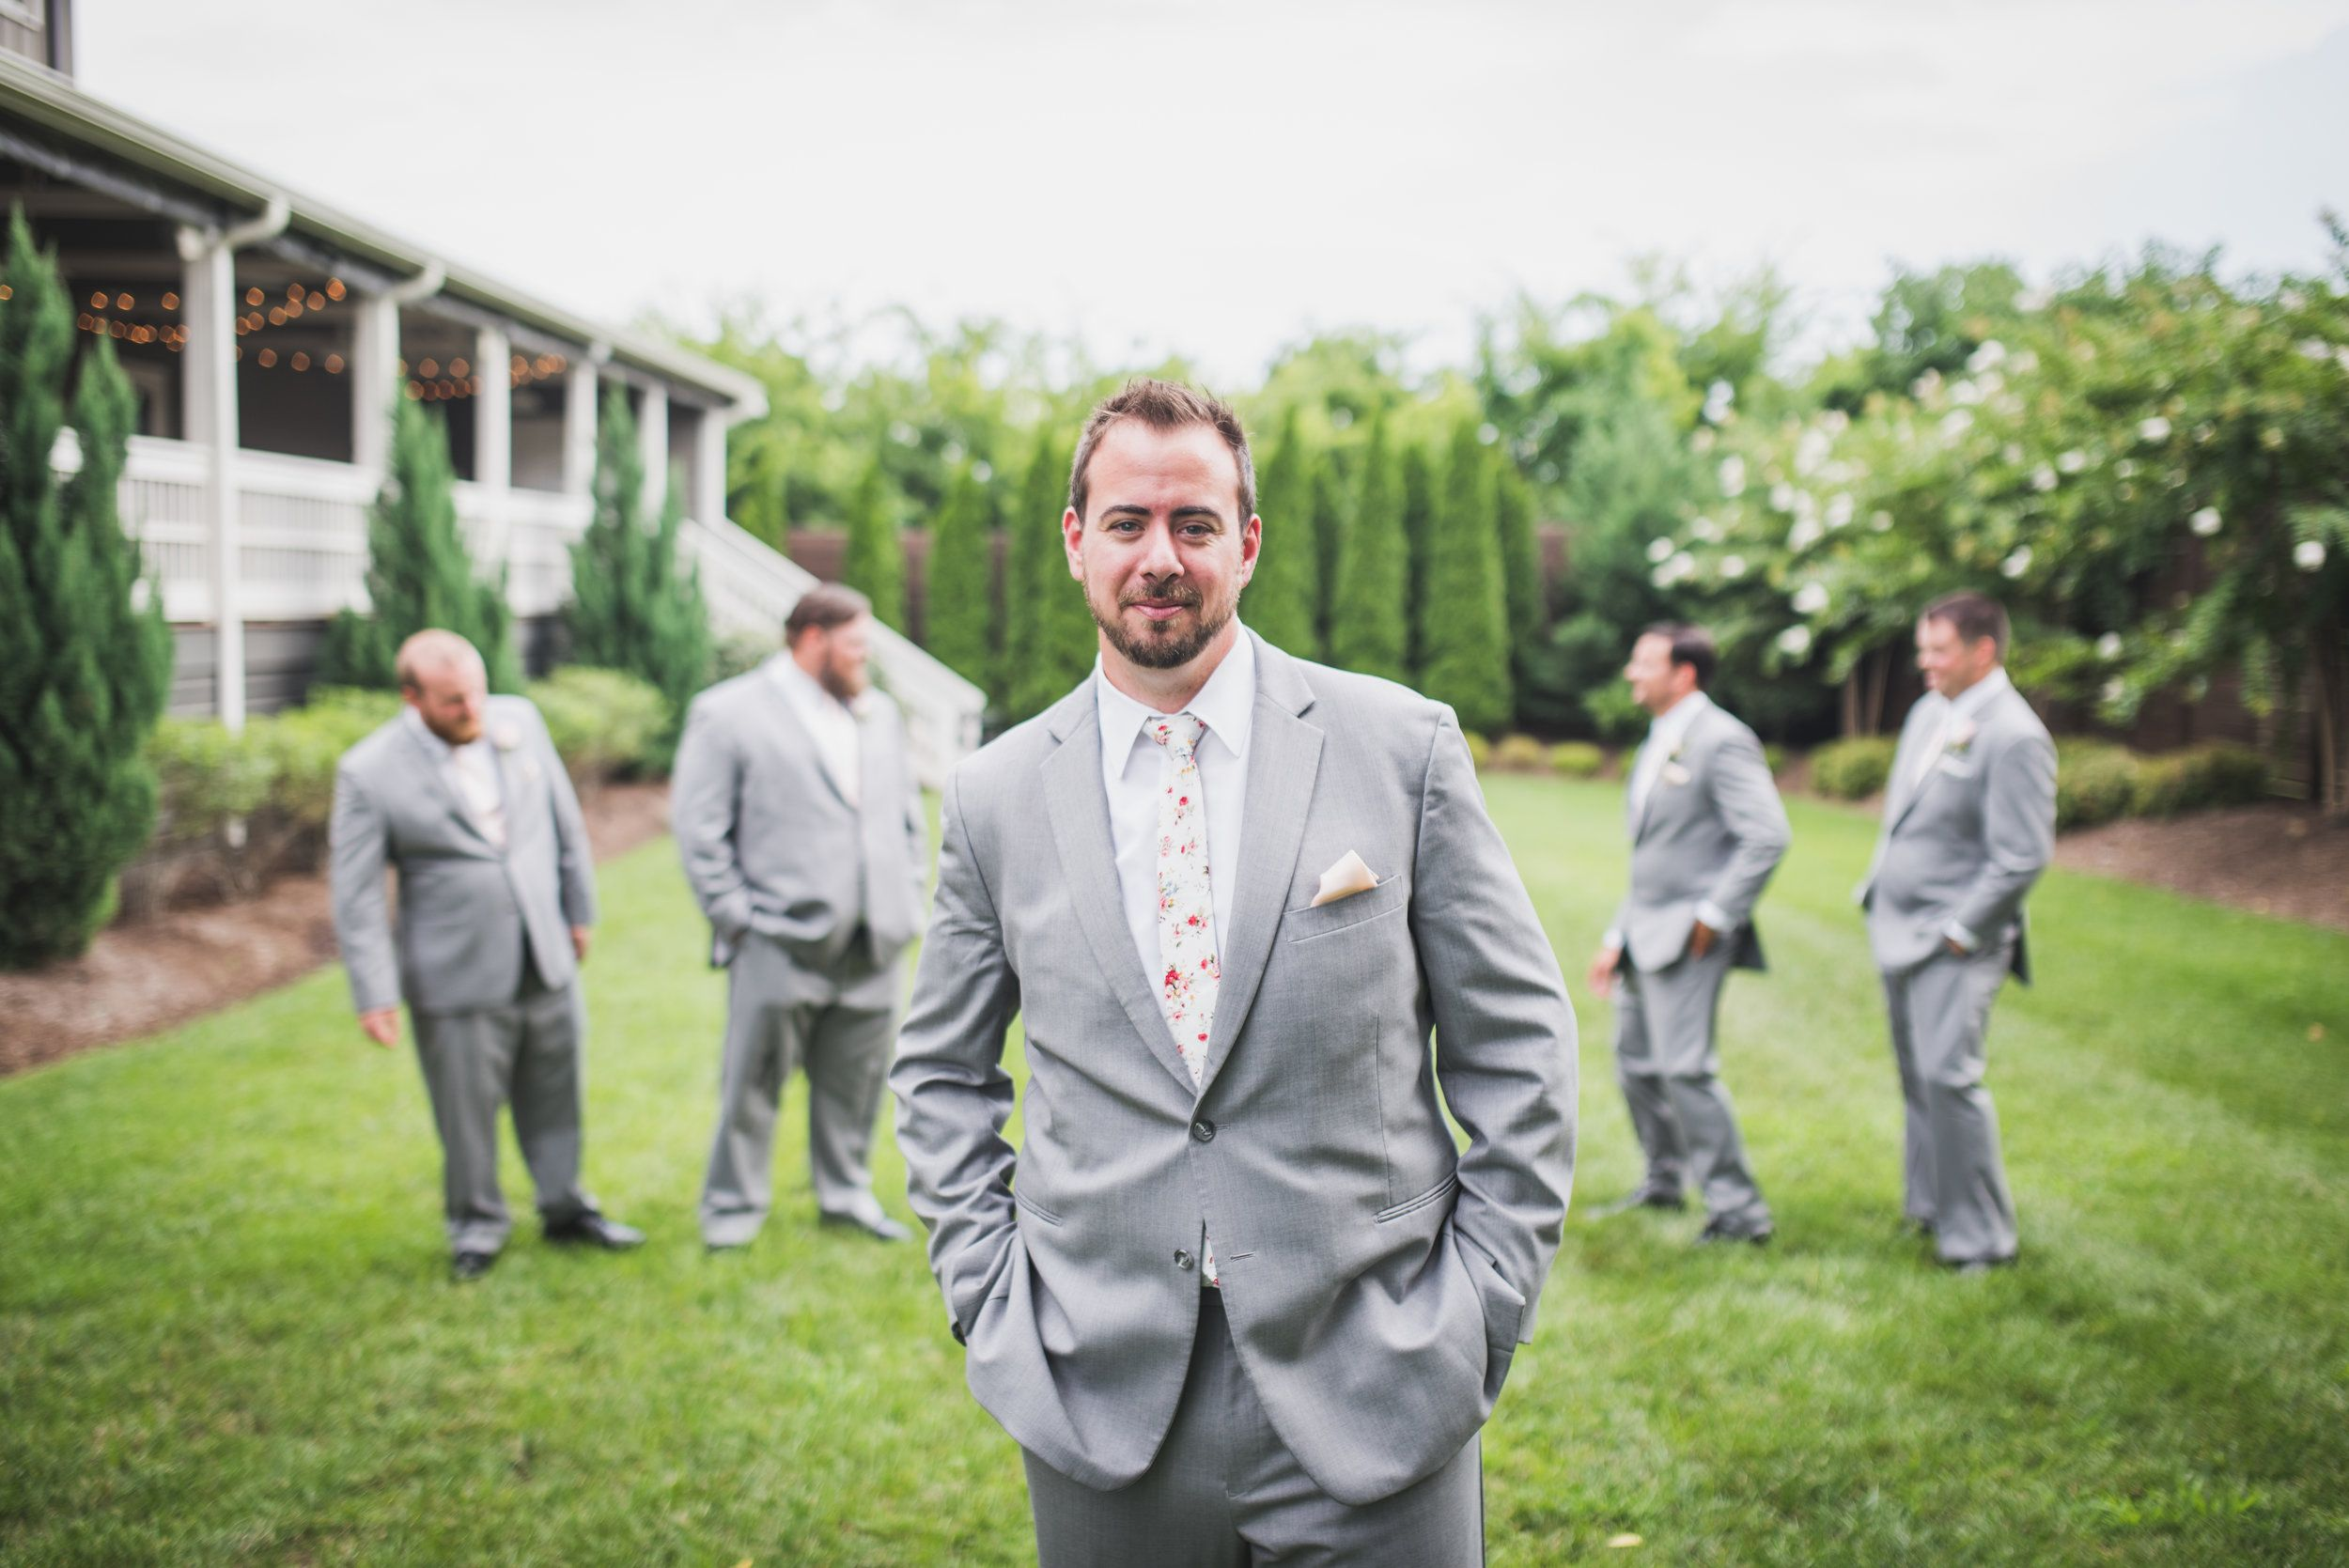 Headshots - John Yates | Nashville, TN Based Photographer